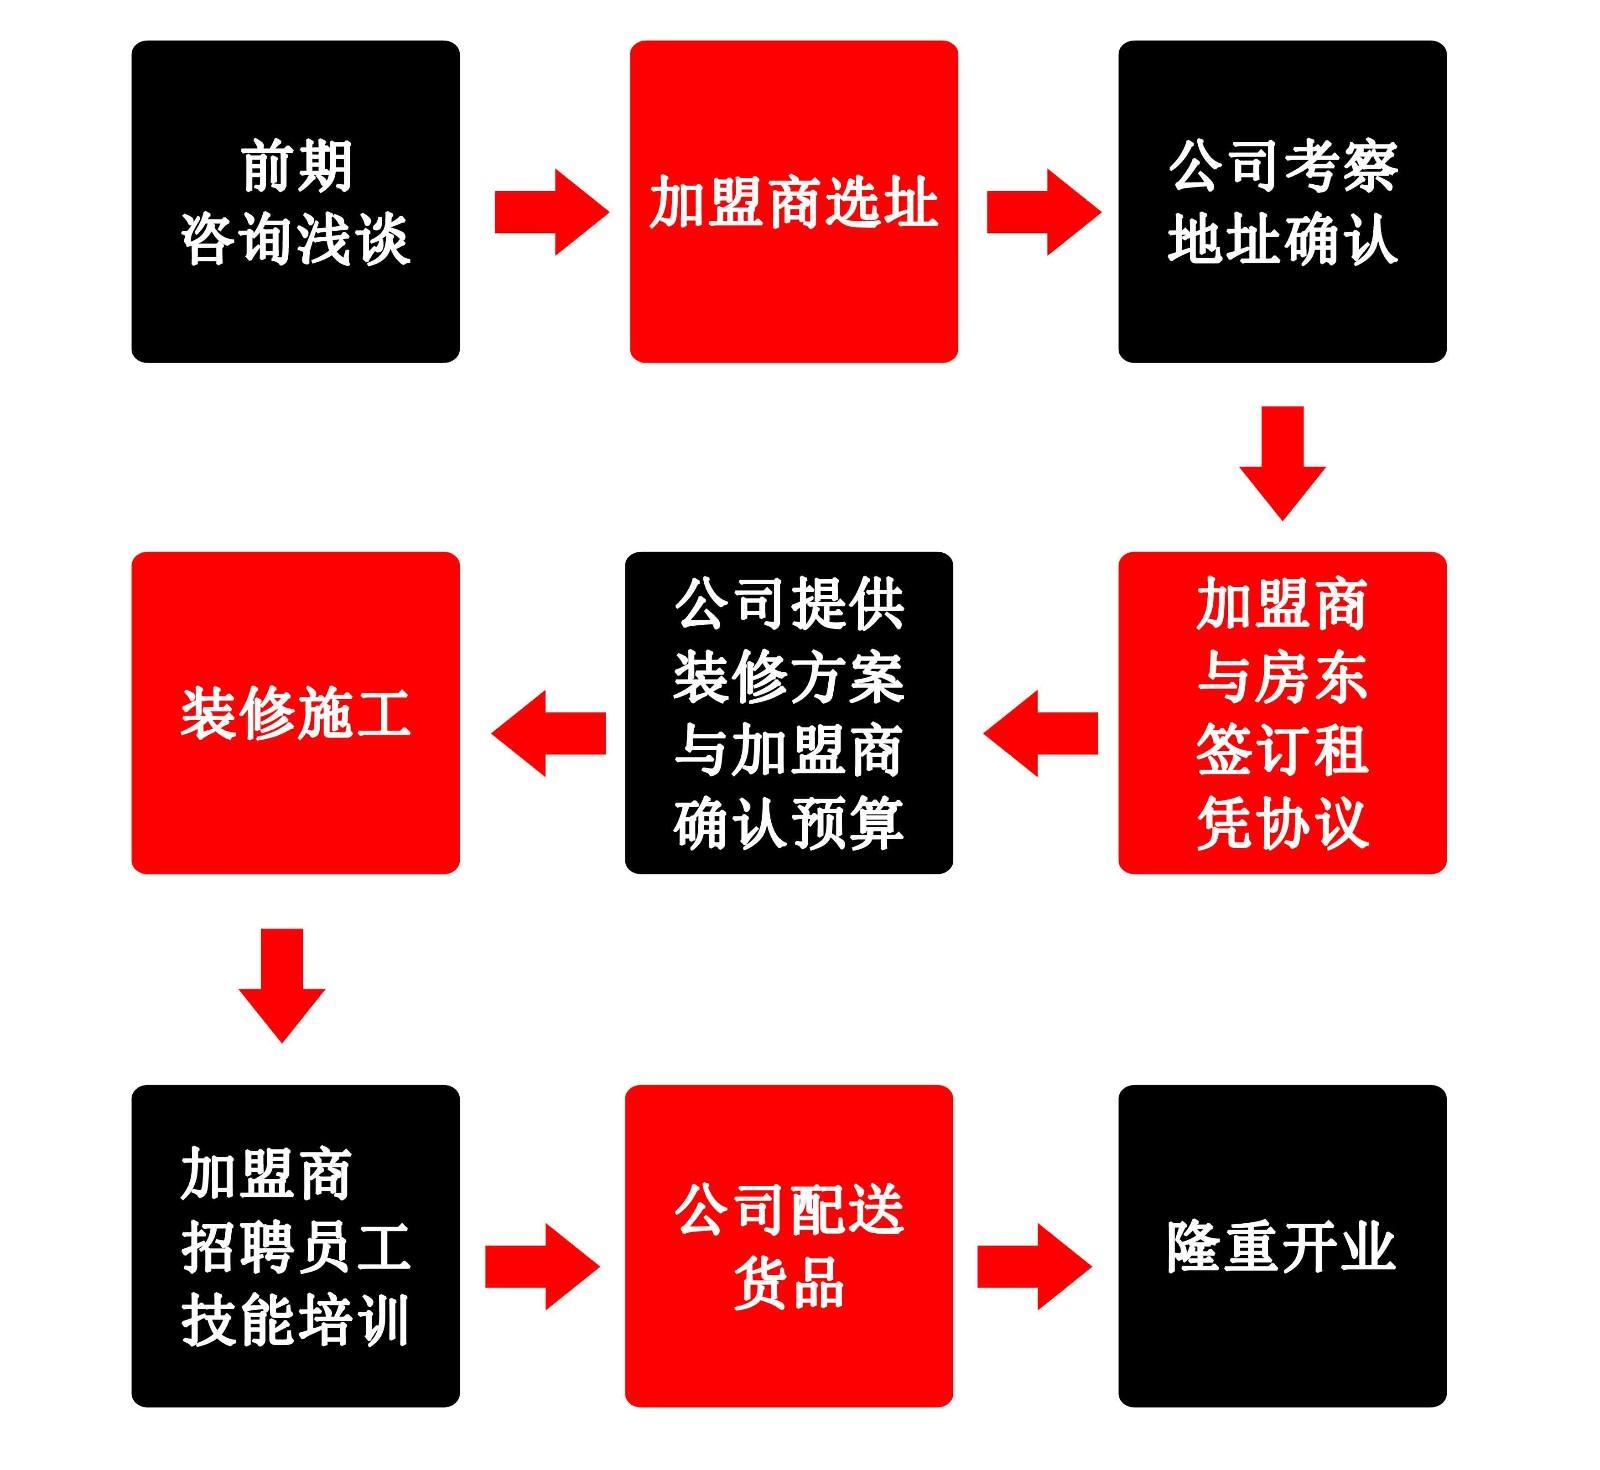 蜀raybetappraybet下载iphone流程